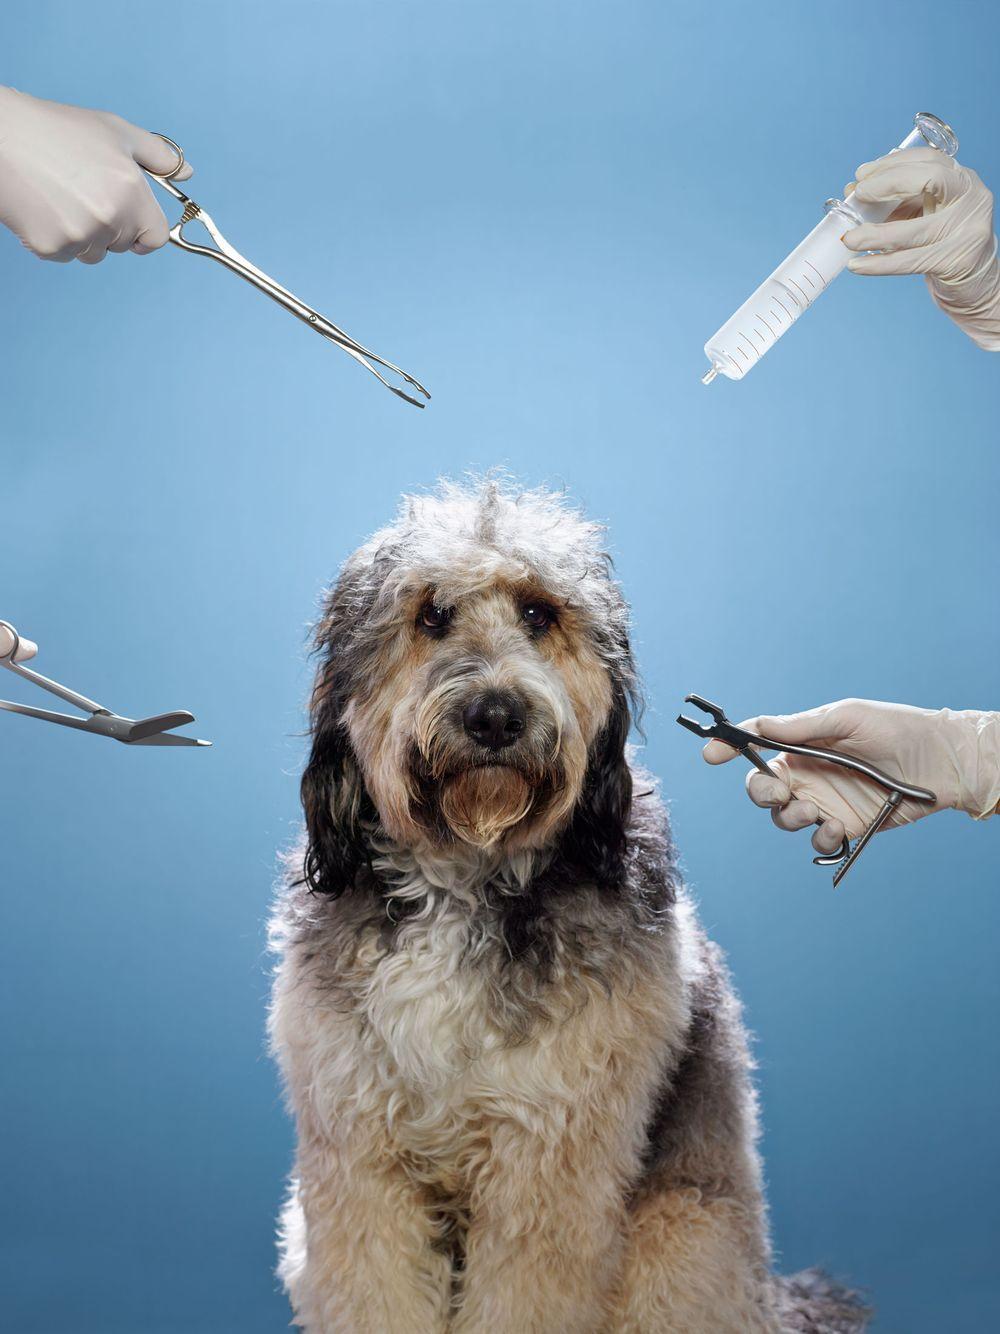 The HighCost, HighRisk World of Modern Pet Care Pets